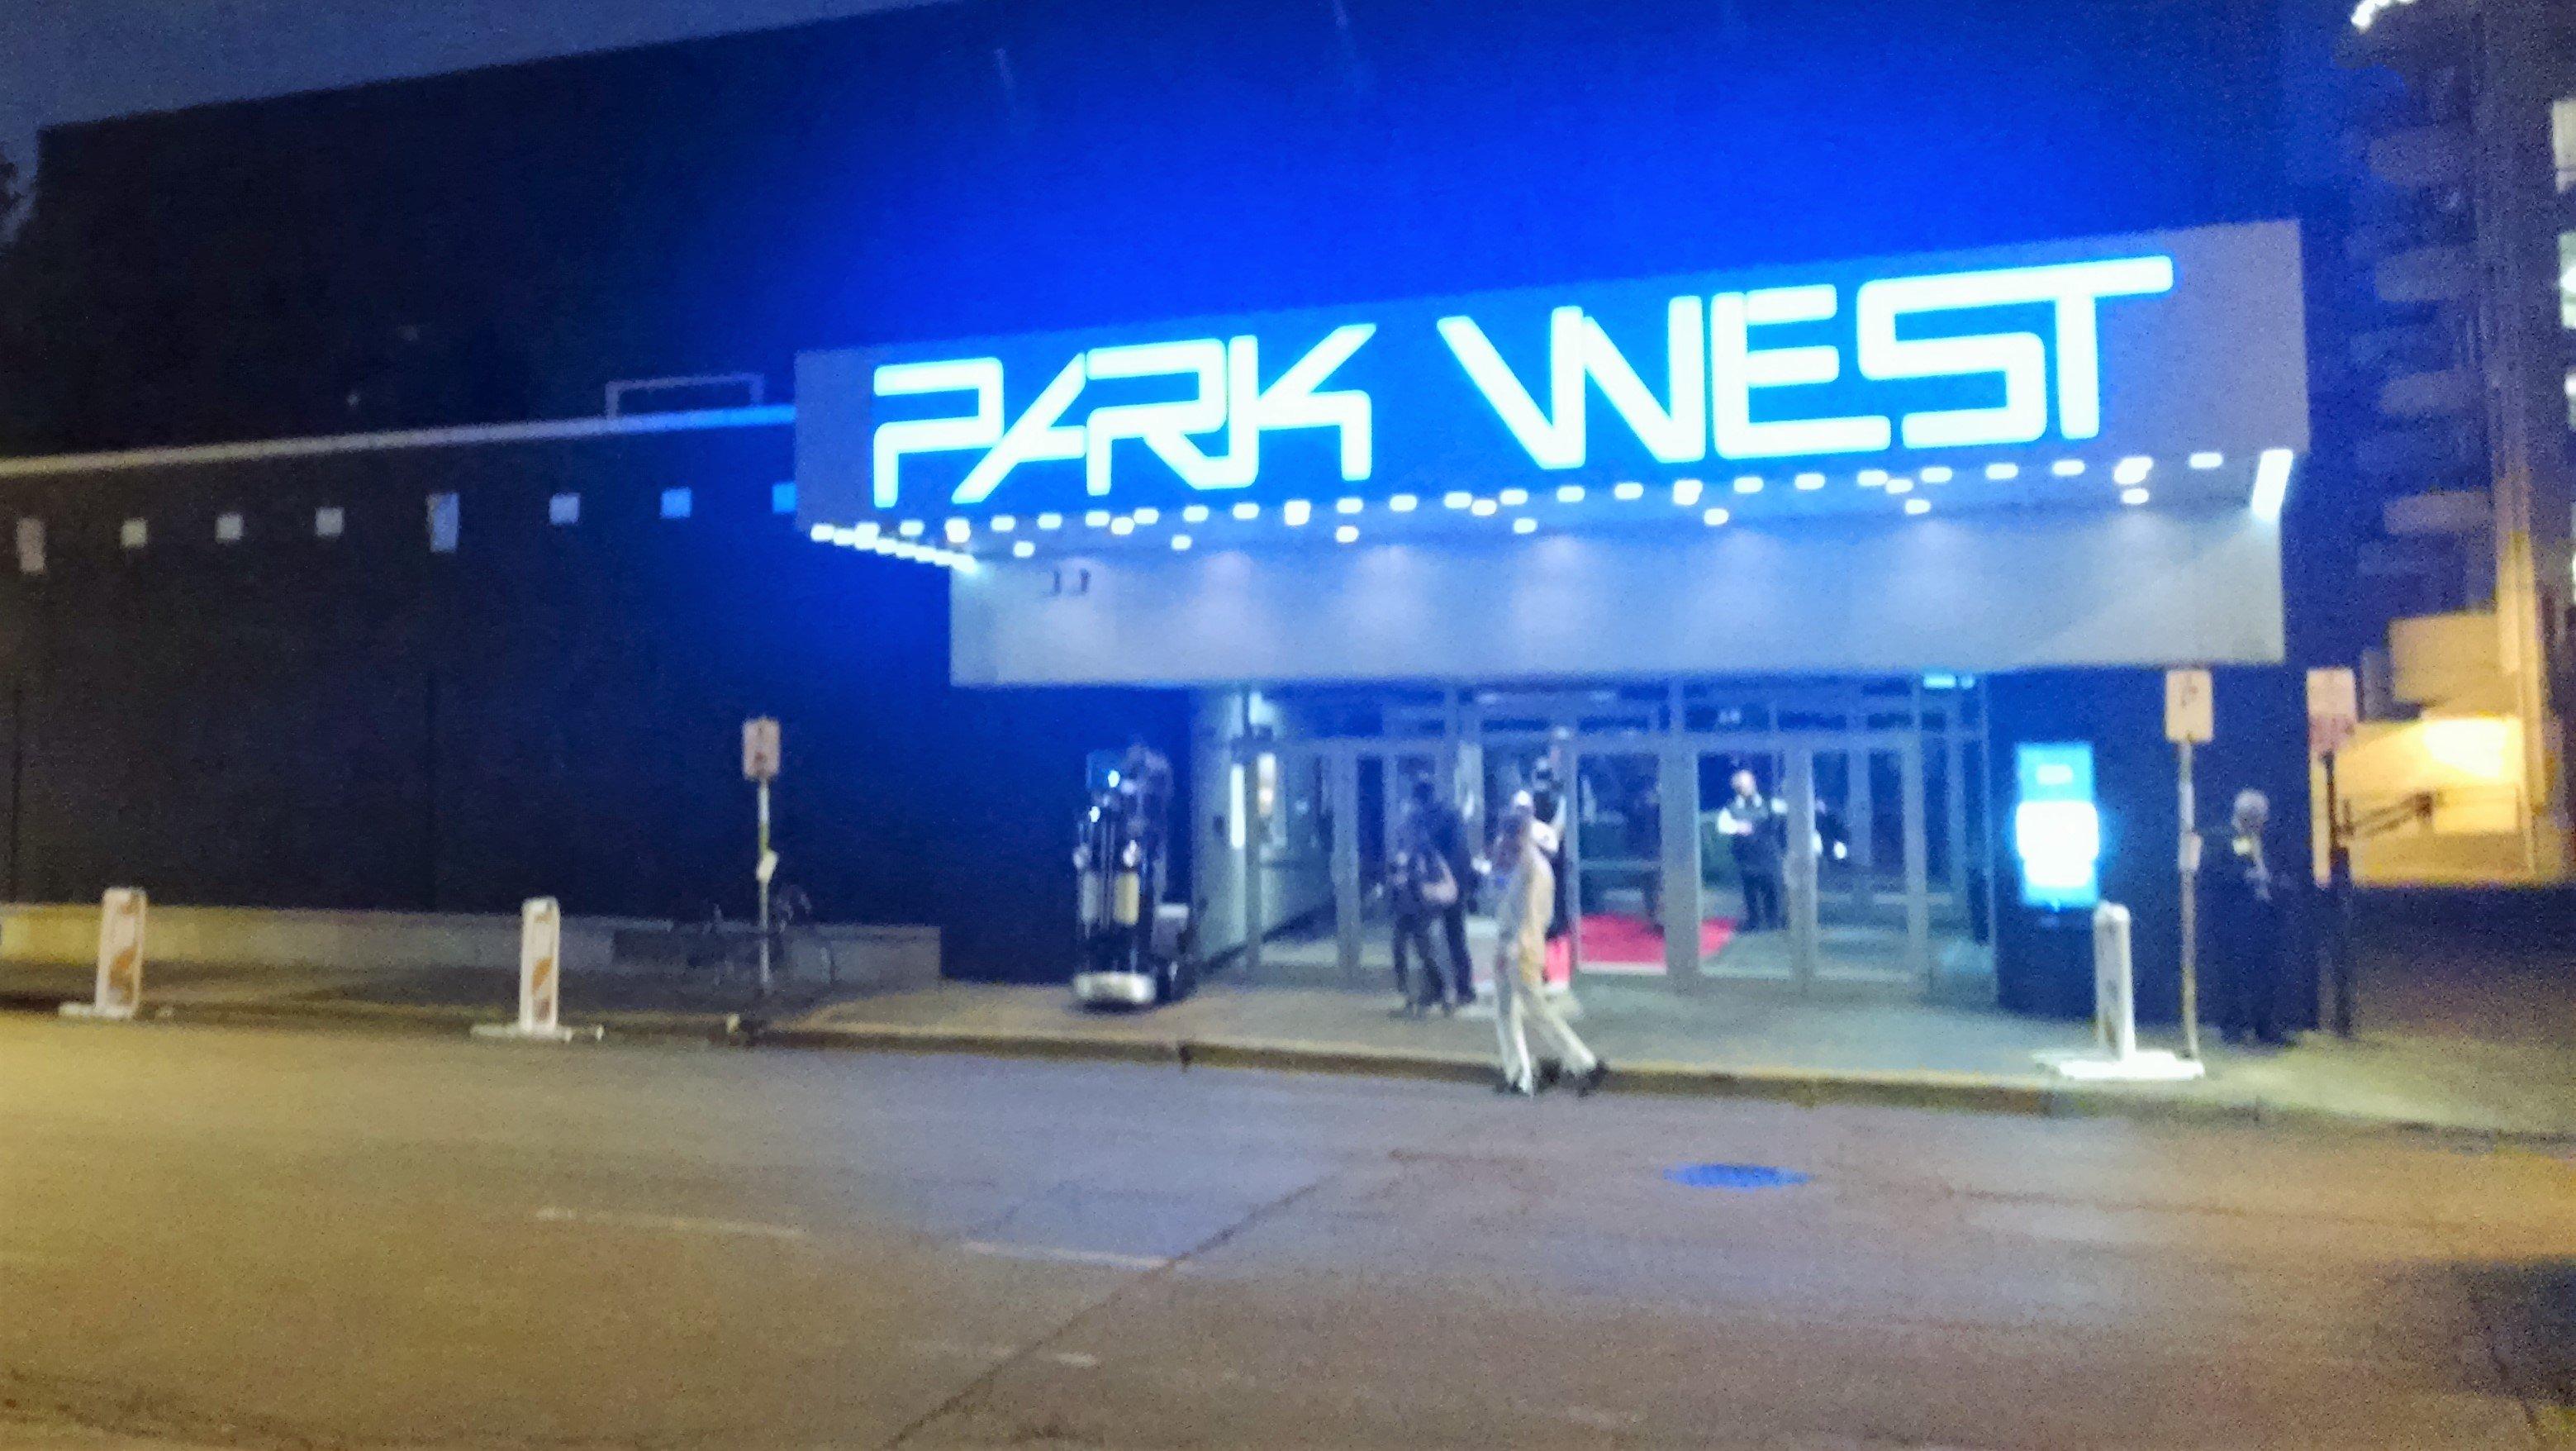 https://www.parkwestchicagoevents.com/wp-content/uploads/2019/02/Park-West-Exterior-Night-Sept-2017.jpg